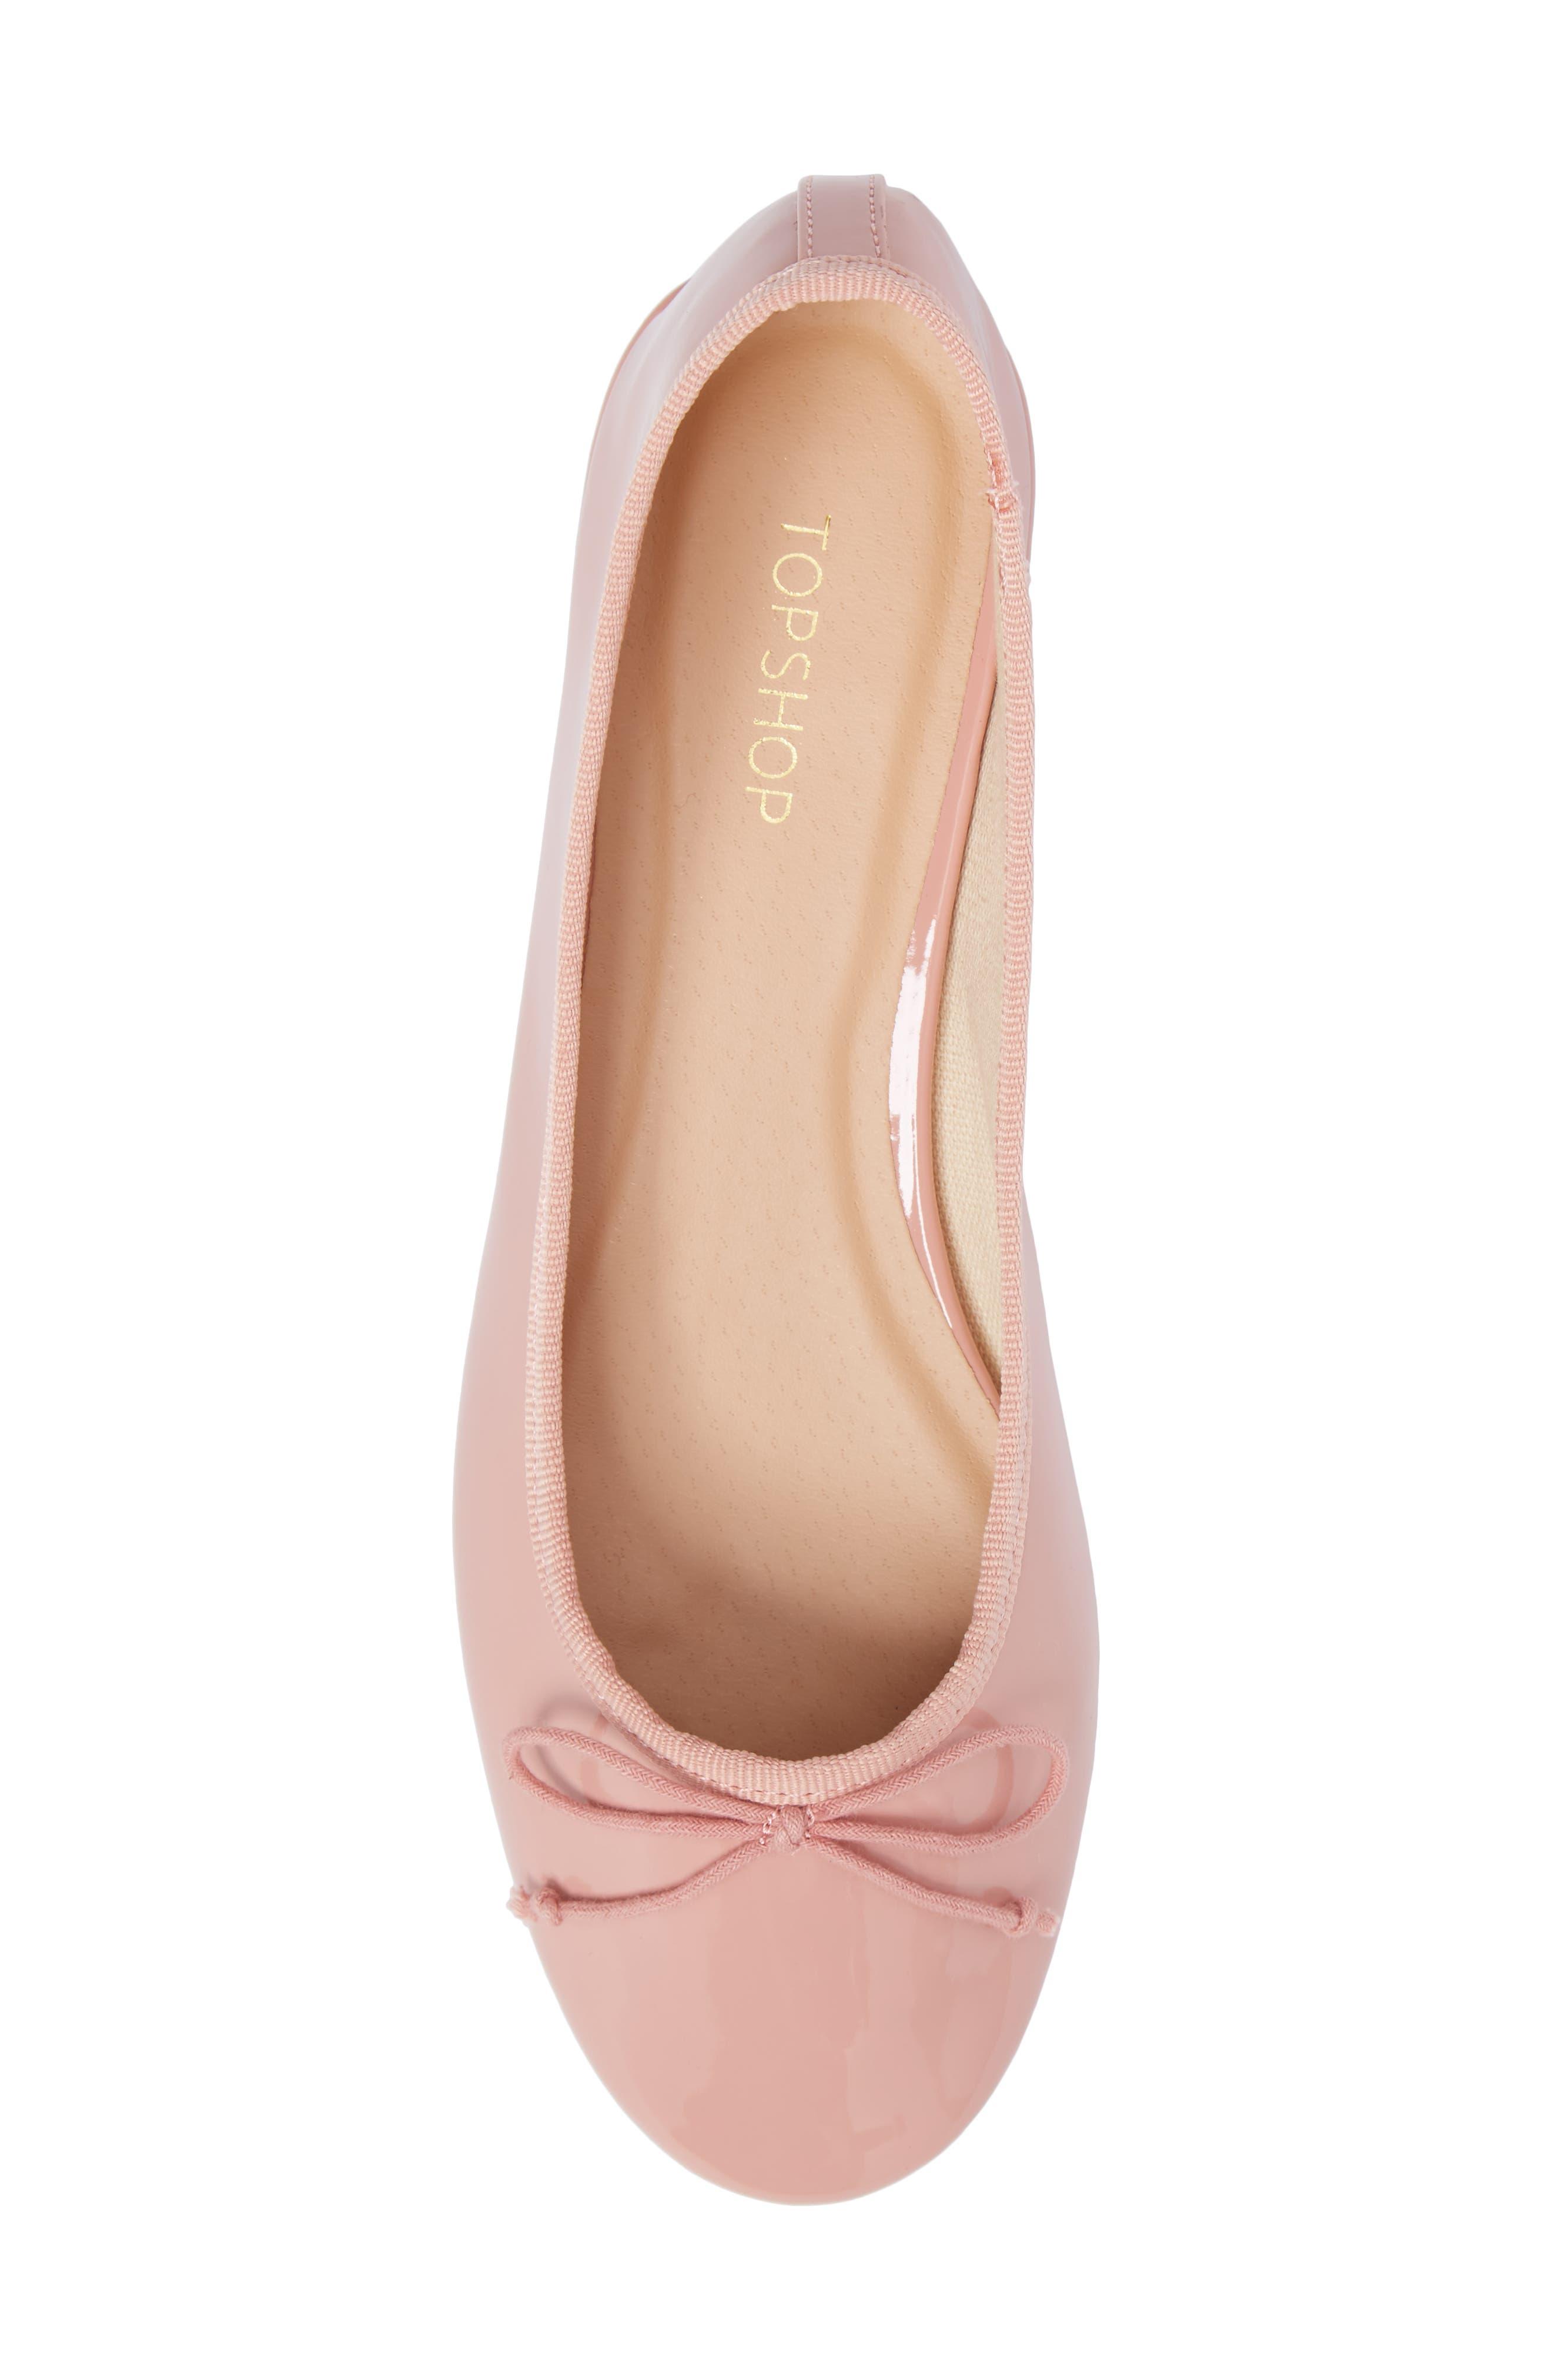 Glory Heeled Ballerina Slippers,                             Alternate thumbnail 6, color,                             650